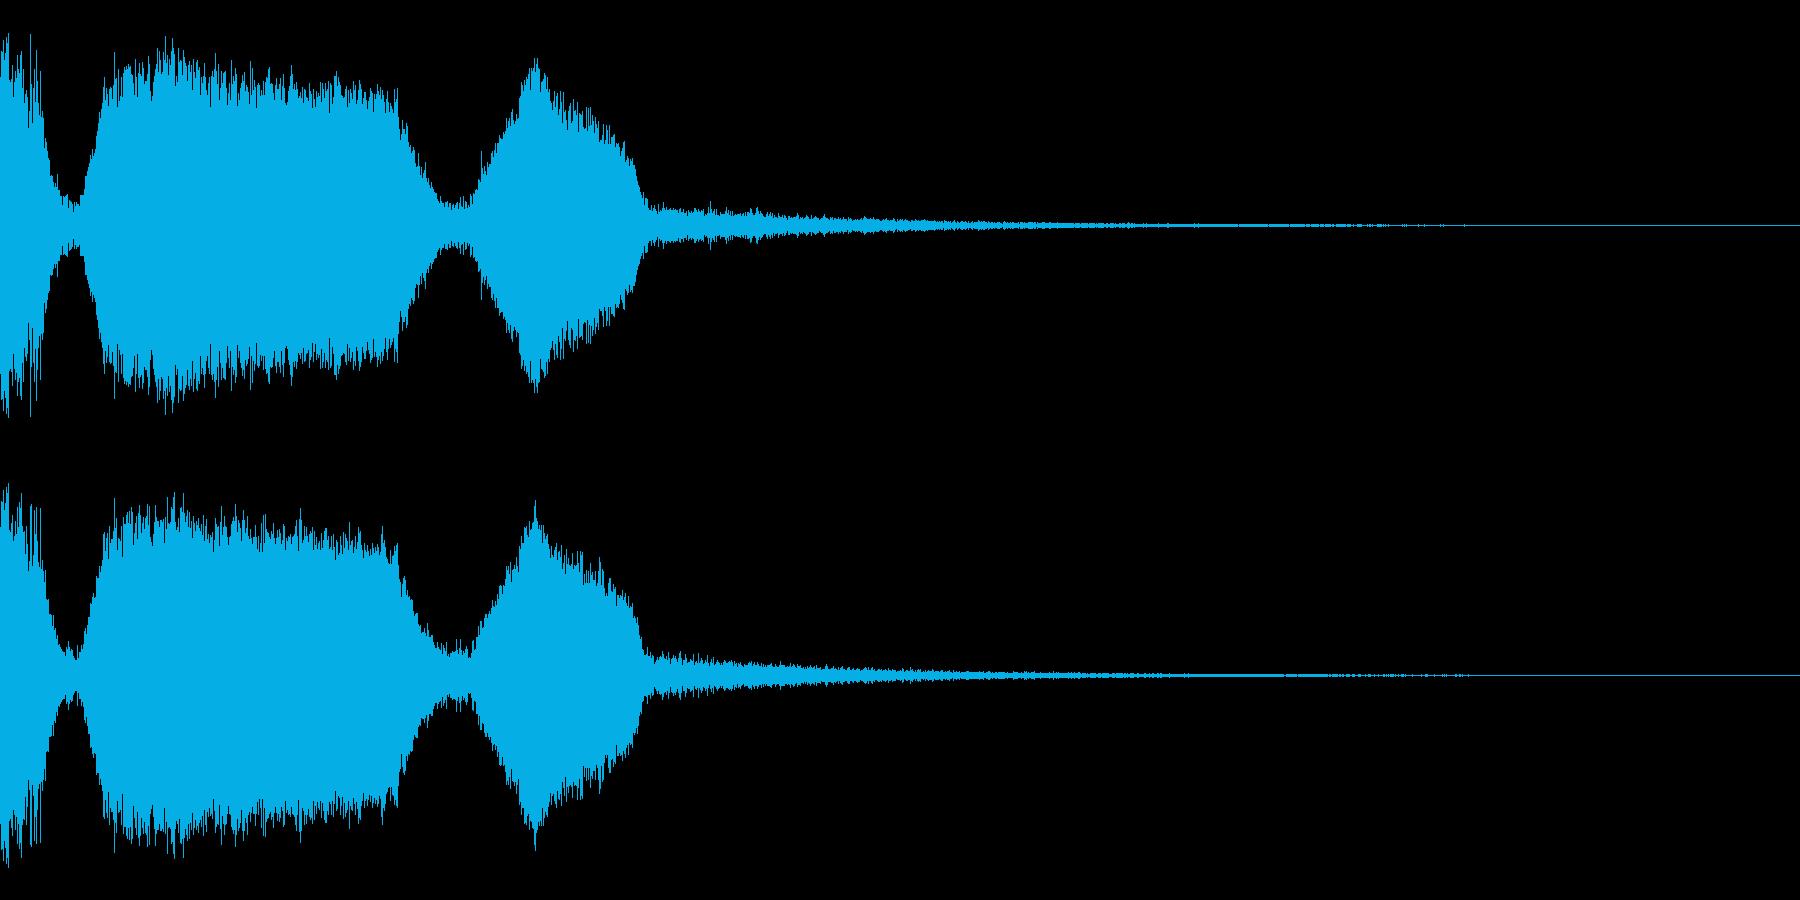 DJFX ヒットチャート発表前SE 17の再生済みの波形